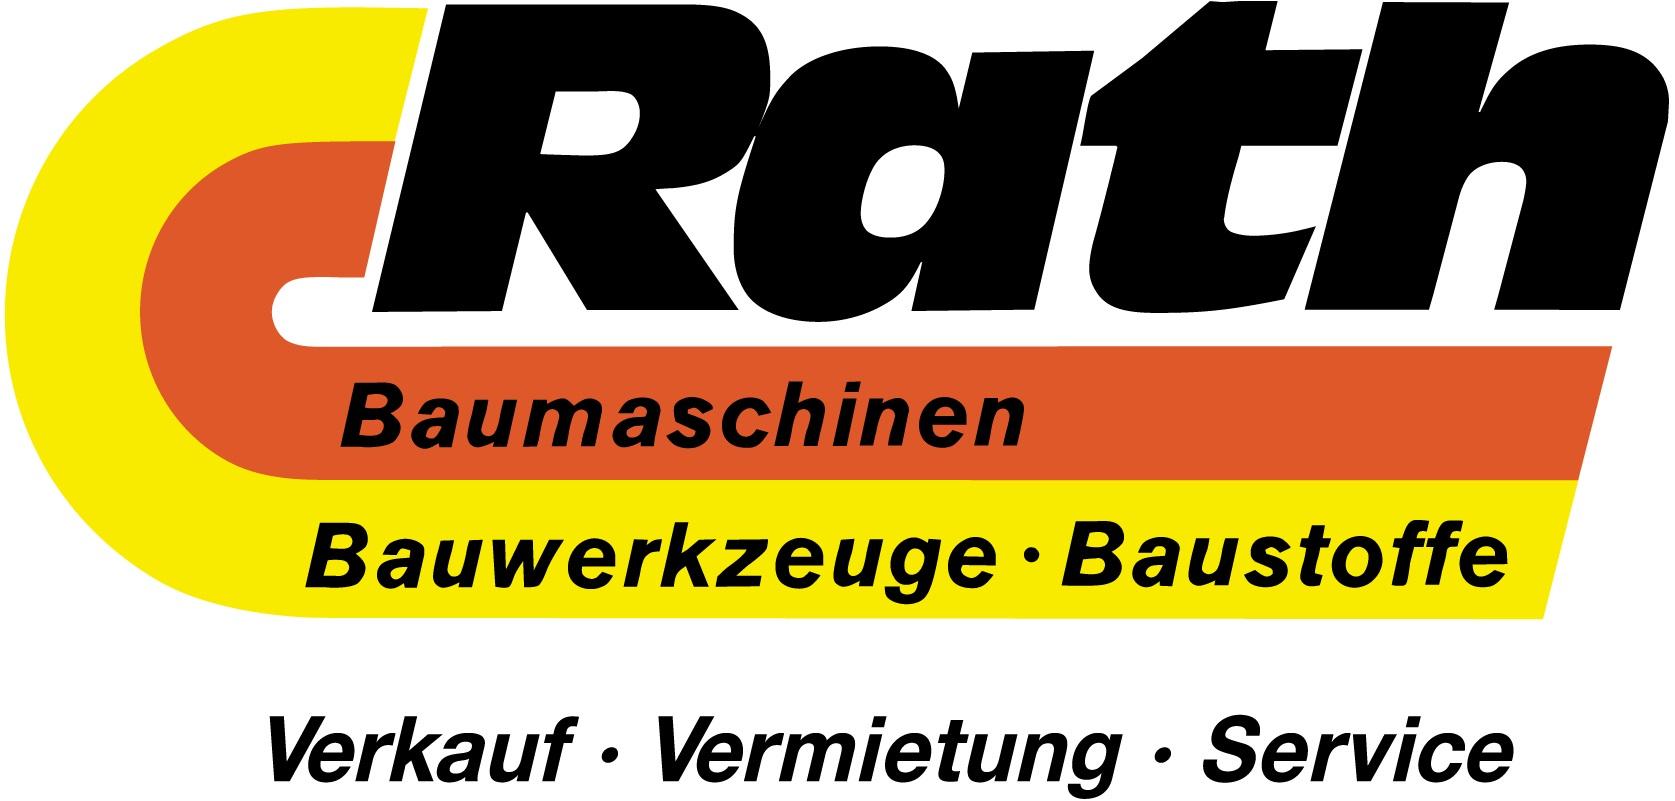 rath_logo_text_bunt